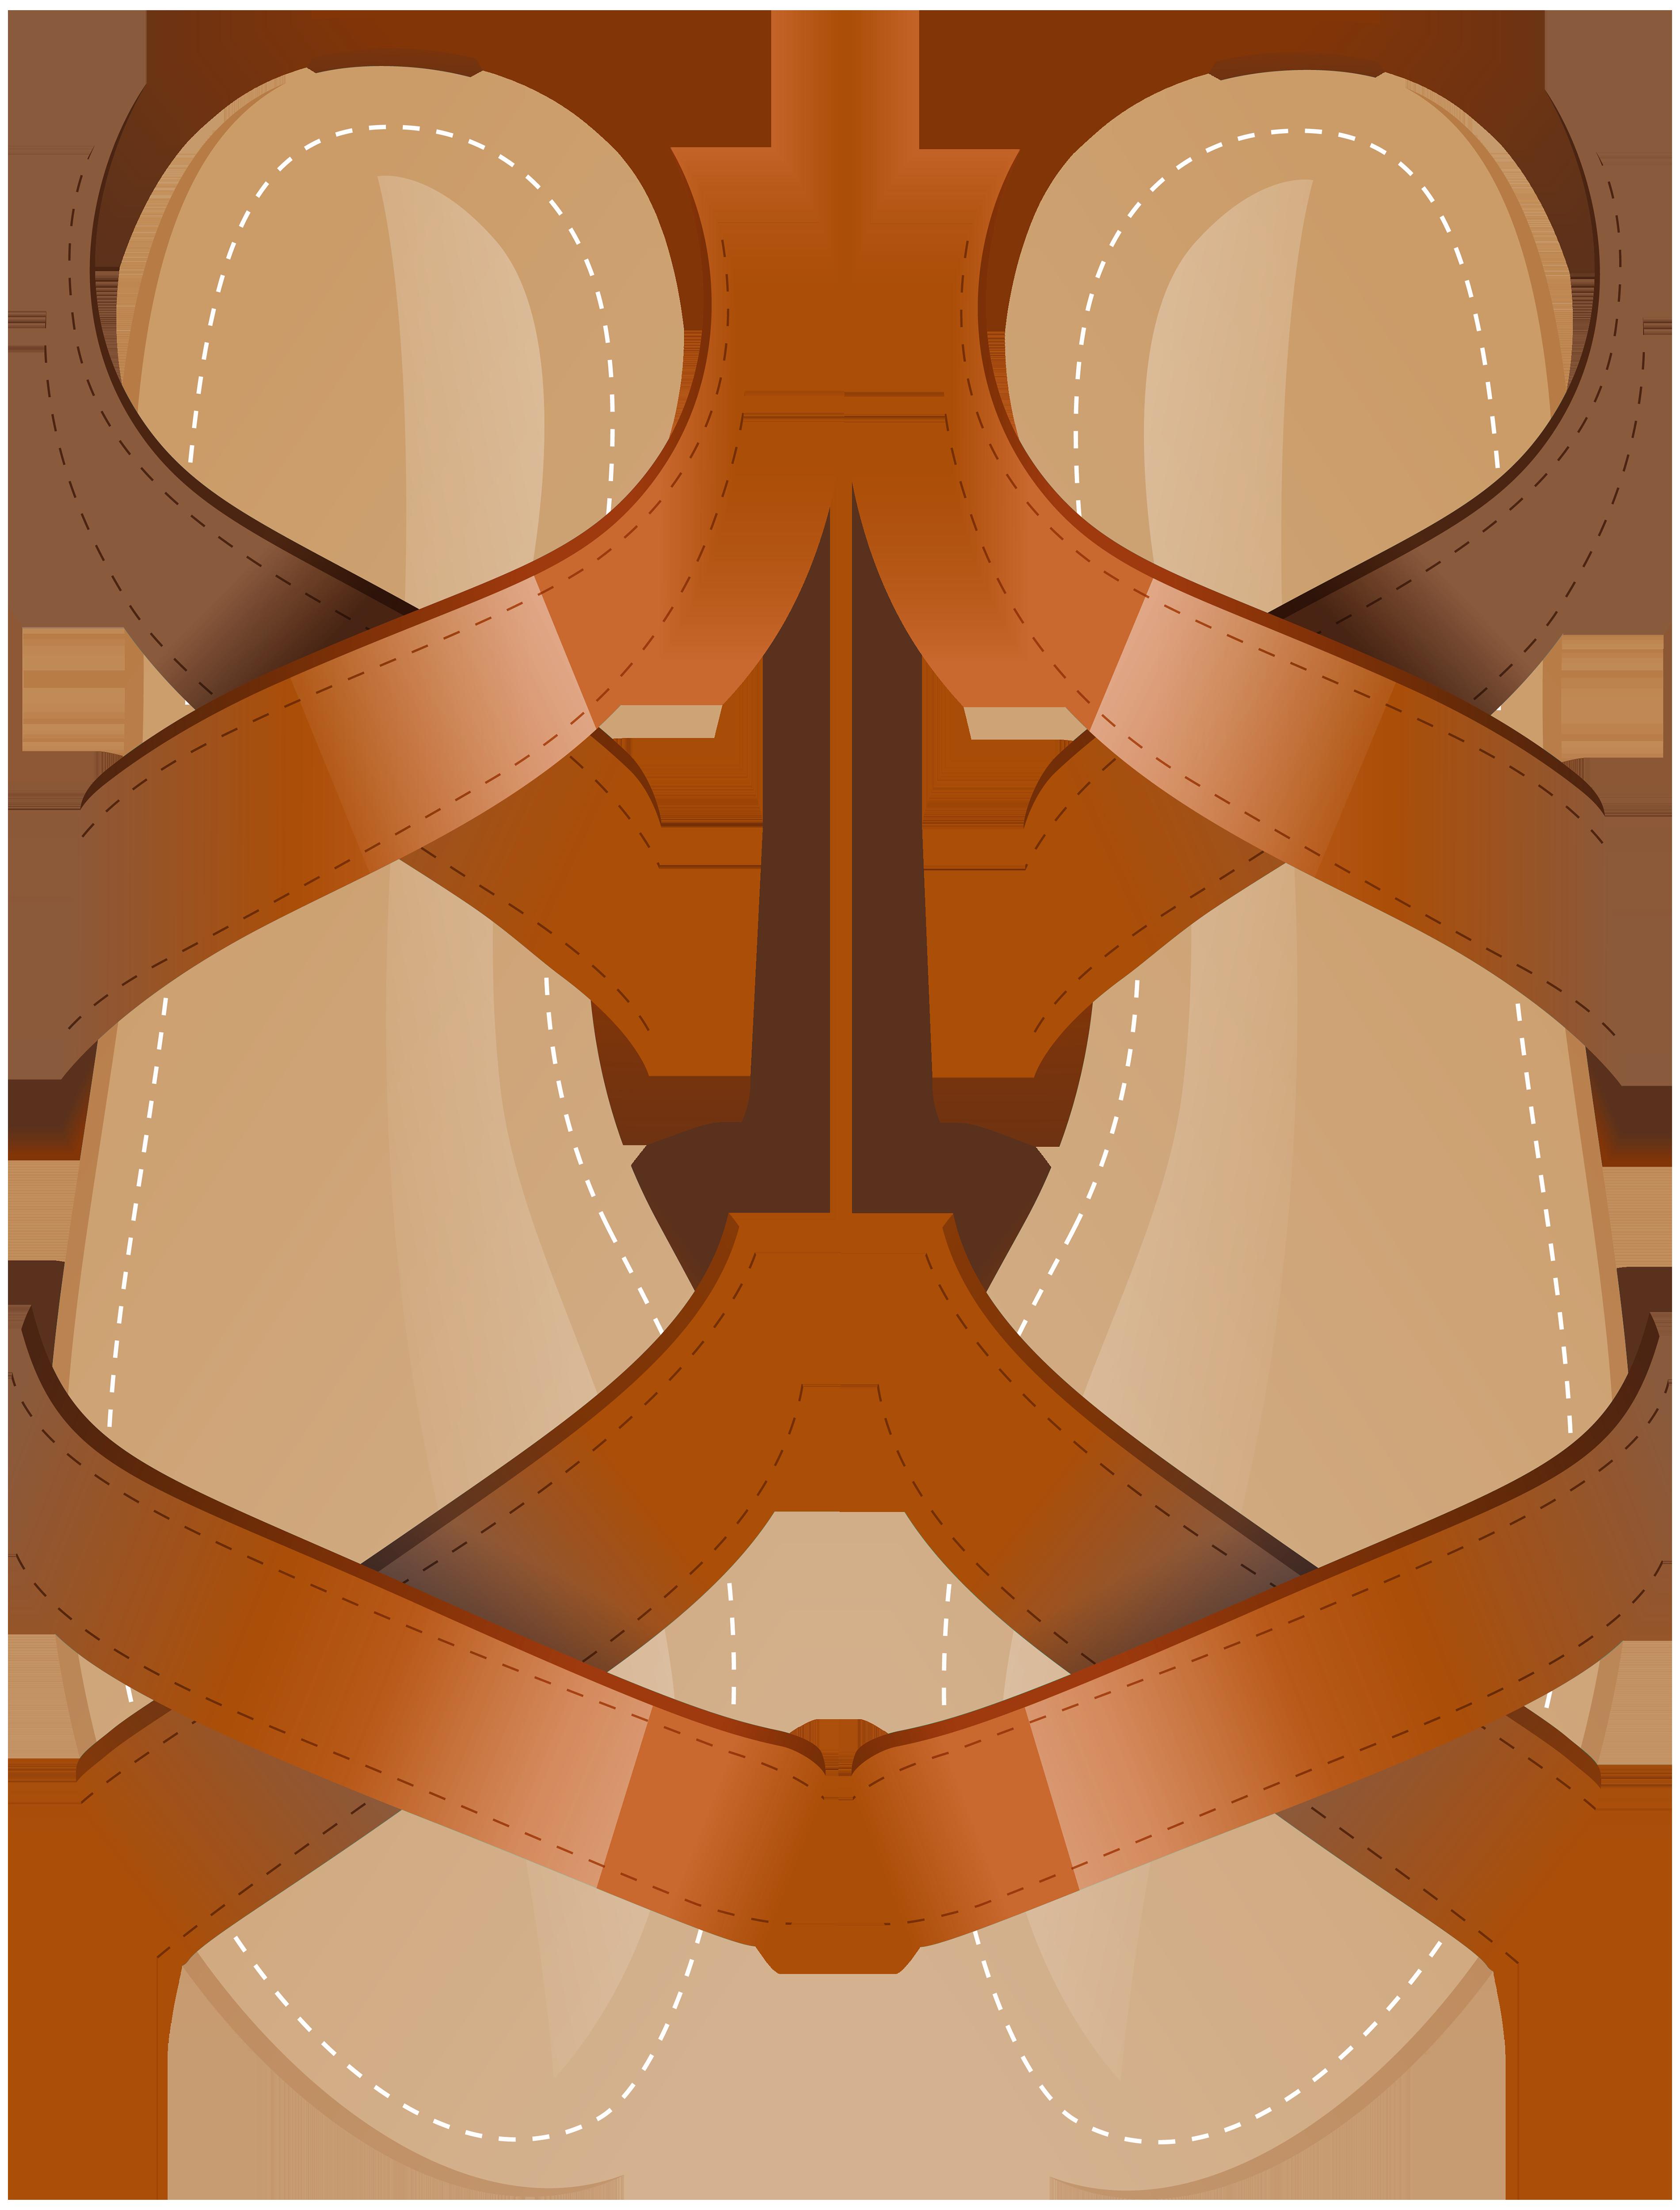 Fish clipart beige. Brown sandals png clip